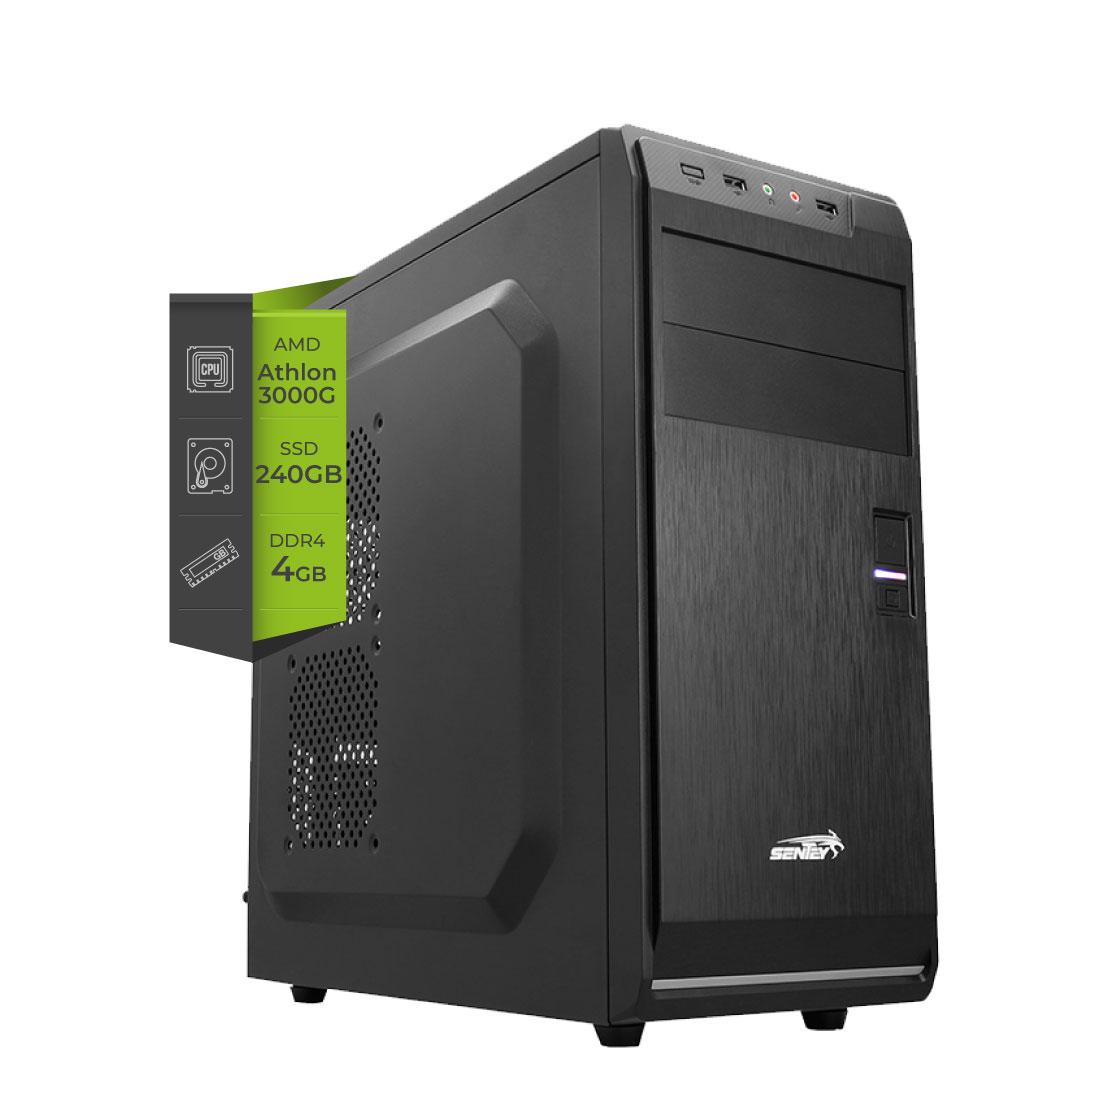 Pc Amd Athlon 320GE SSD 240Gb